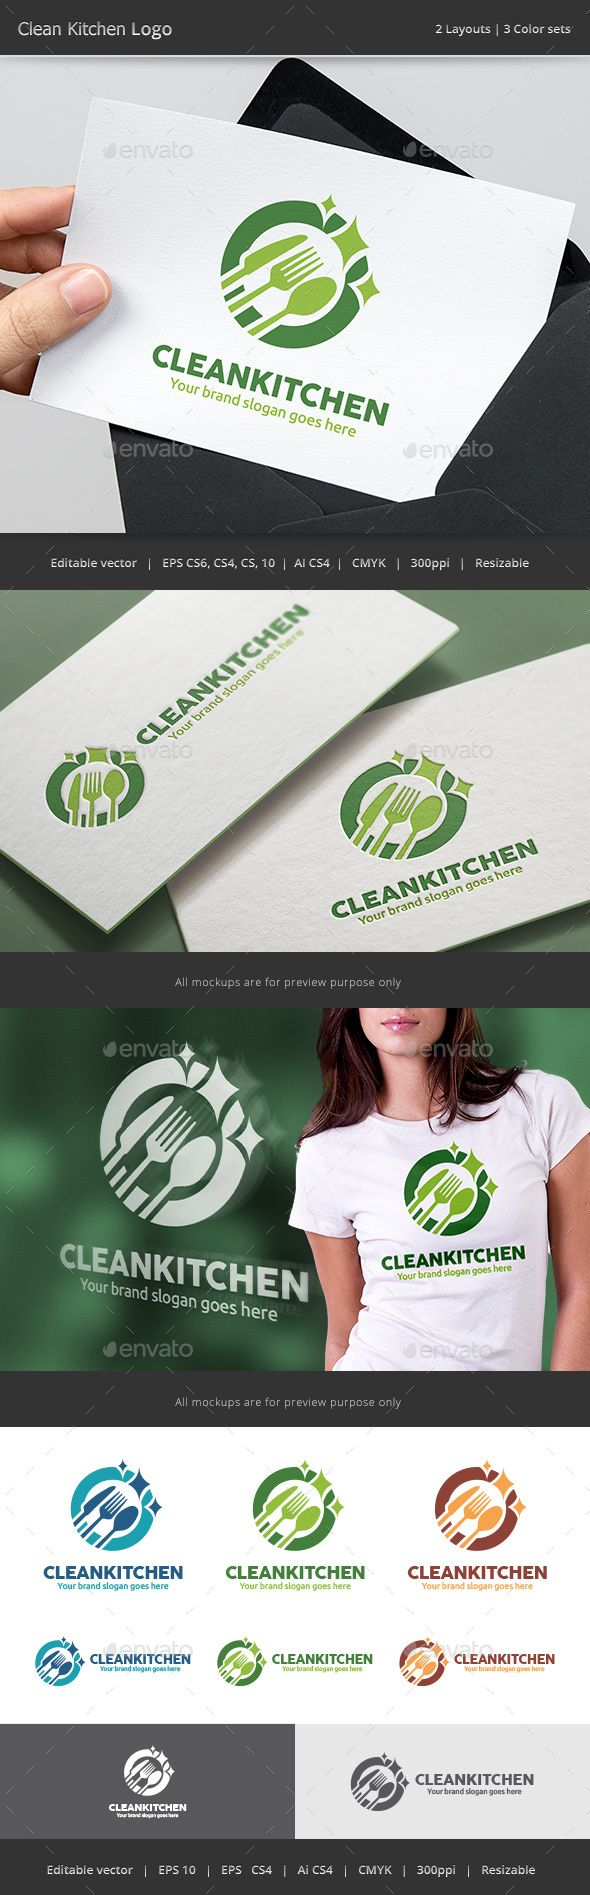 clean kitchen logo kitchen logo logo design template and clean kitchen logo design template vector logotype download it here http